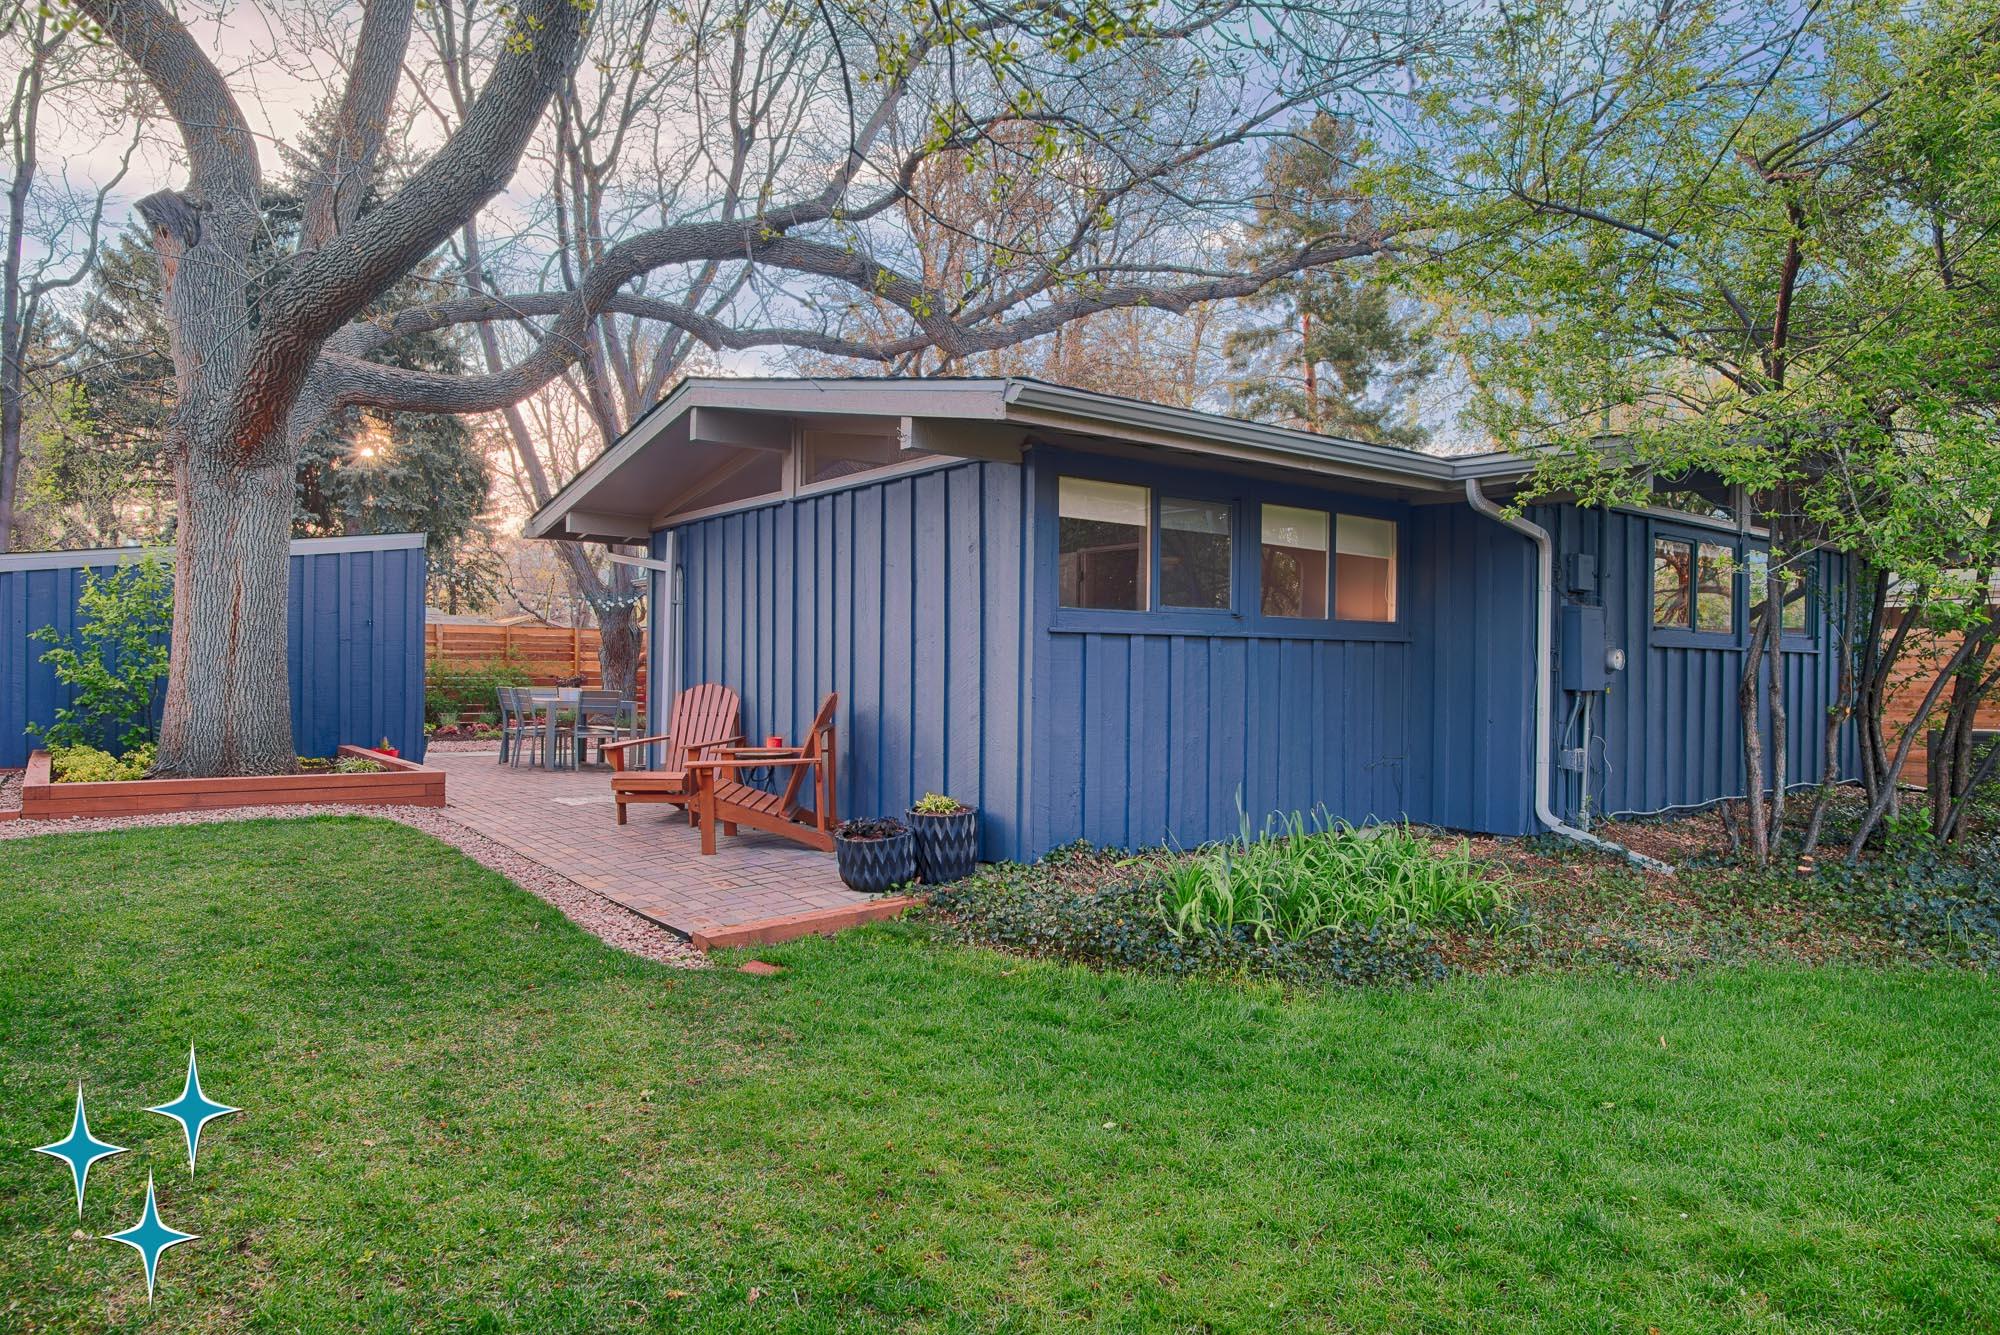 Adrian-Kinney-2560-S-Newton-Street-Denver-Cliff-May-Harvey-Park-2000w50-3SWM-20.jpg